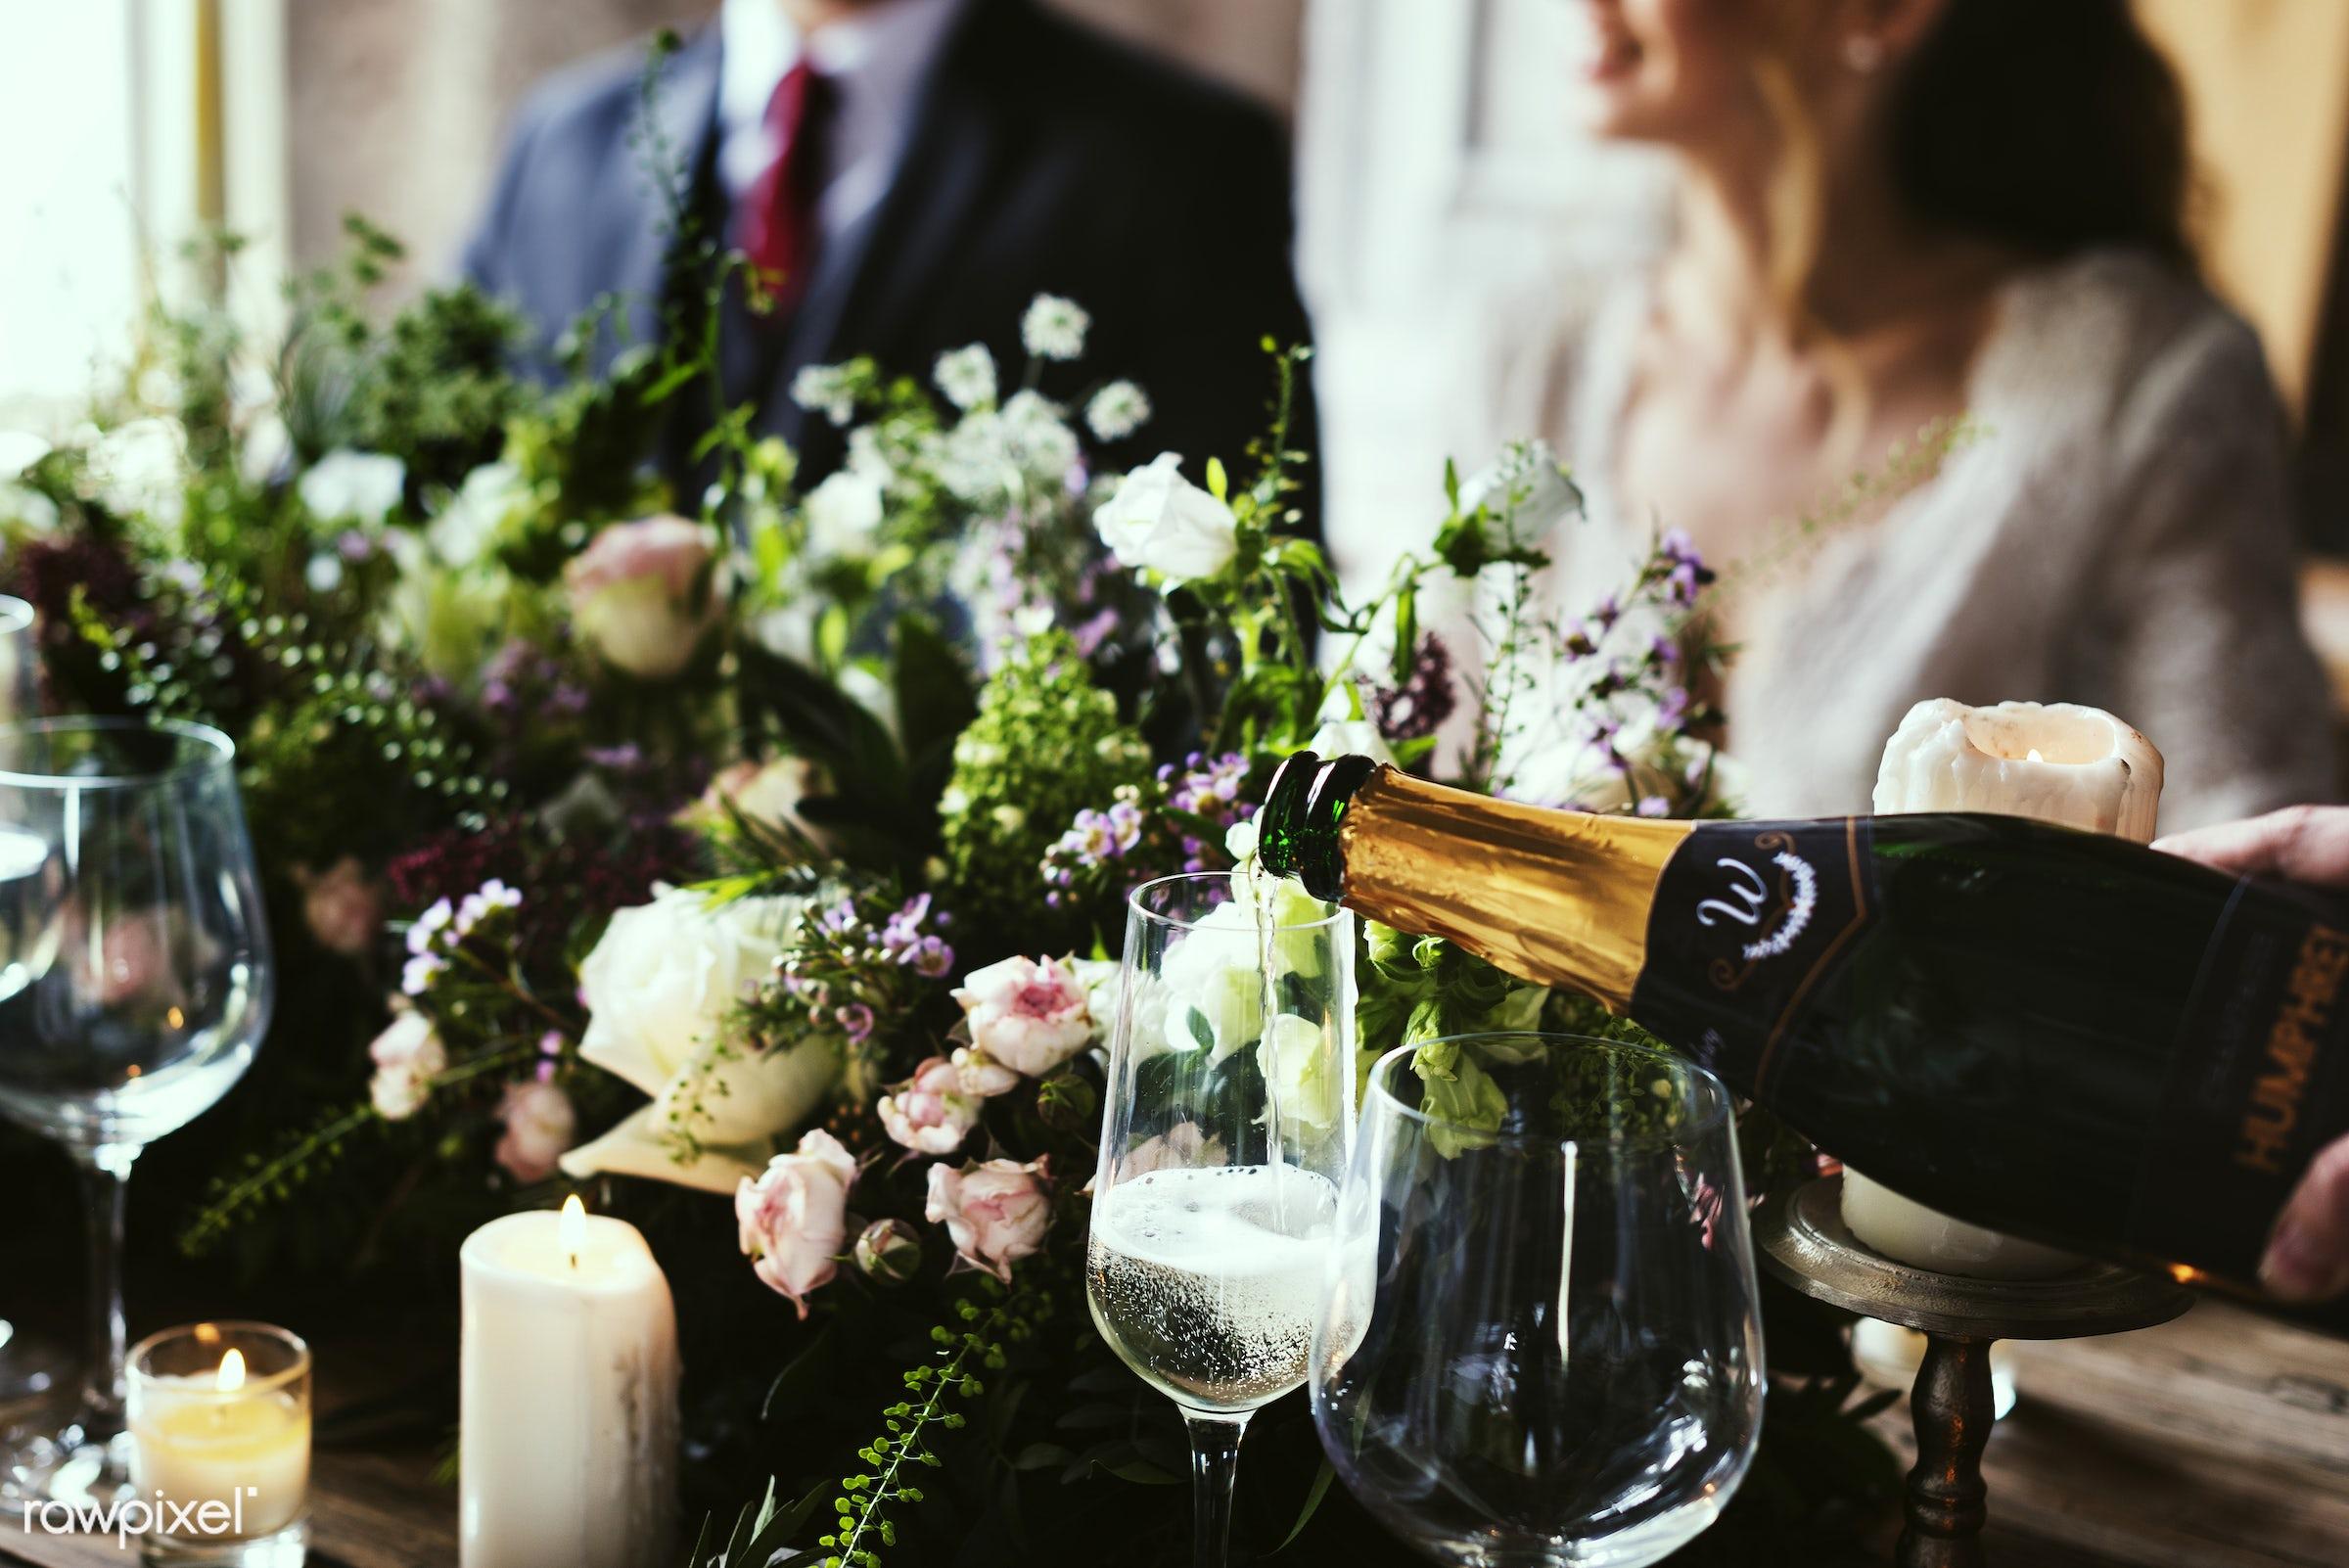 Restaurant Staff Poring Serving Wine to Customers - wedding, groom, adult, bridal, bride, celebrate, celebration, cheerful,...